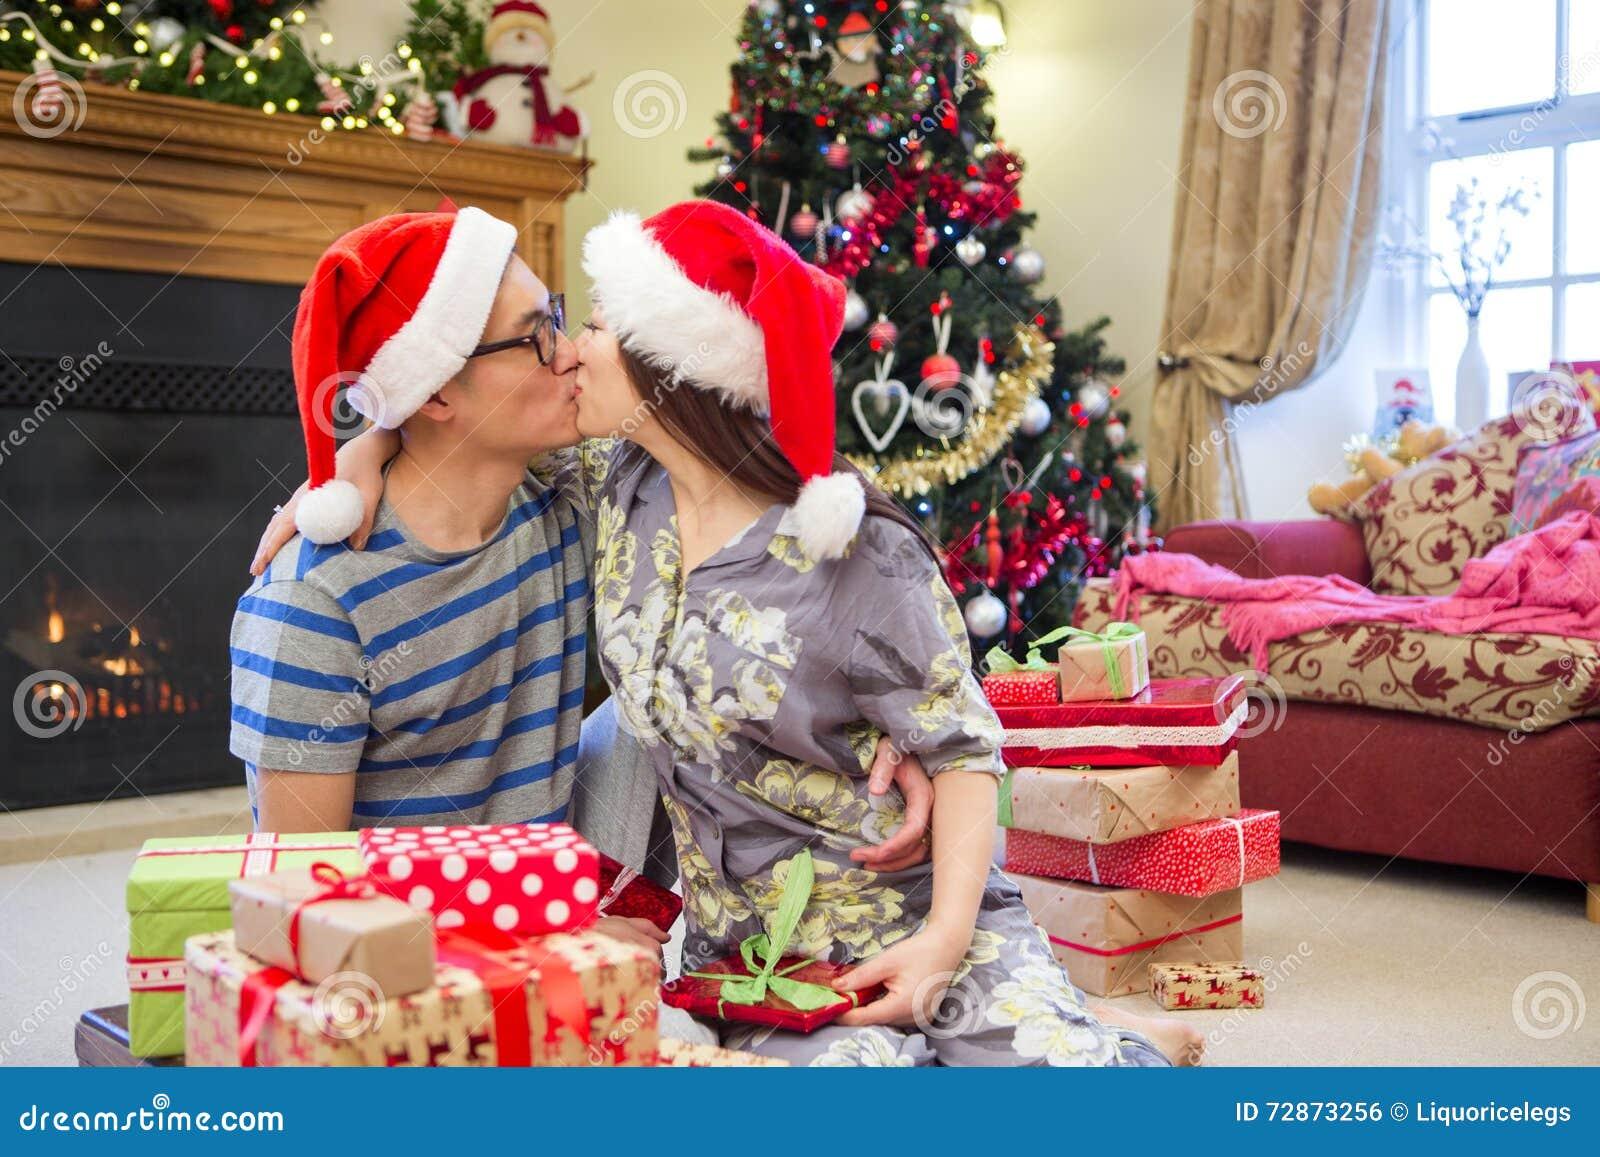 Christmas Morning Kiss Stock Photo 72873256 - Megapixl